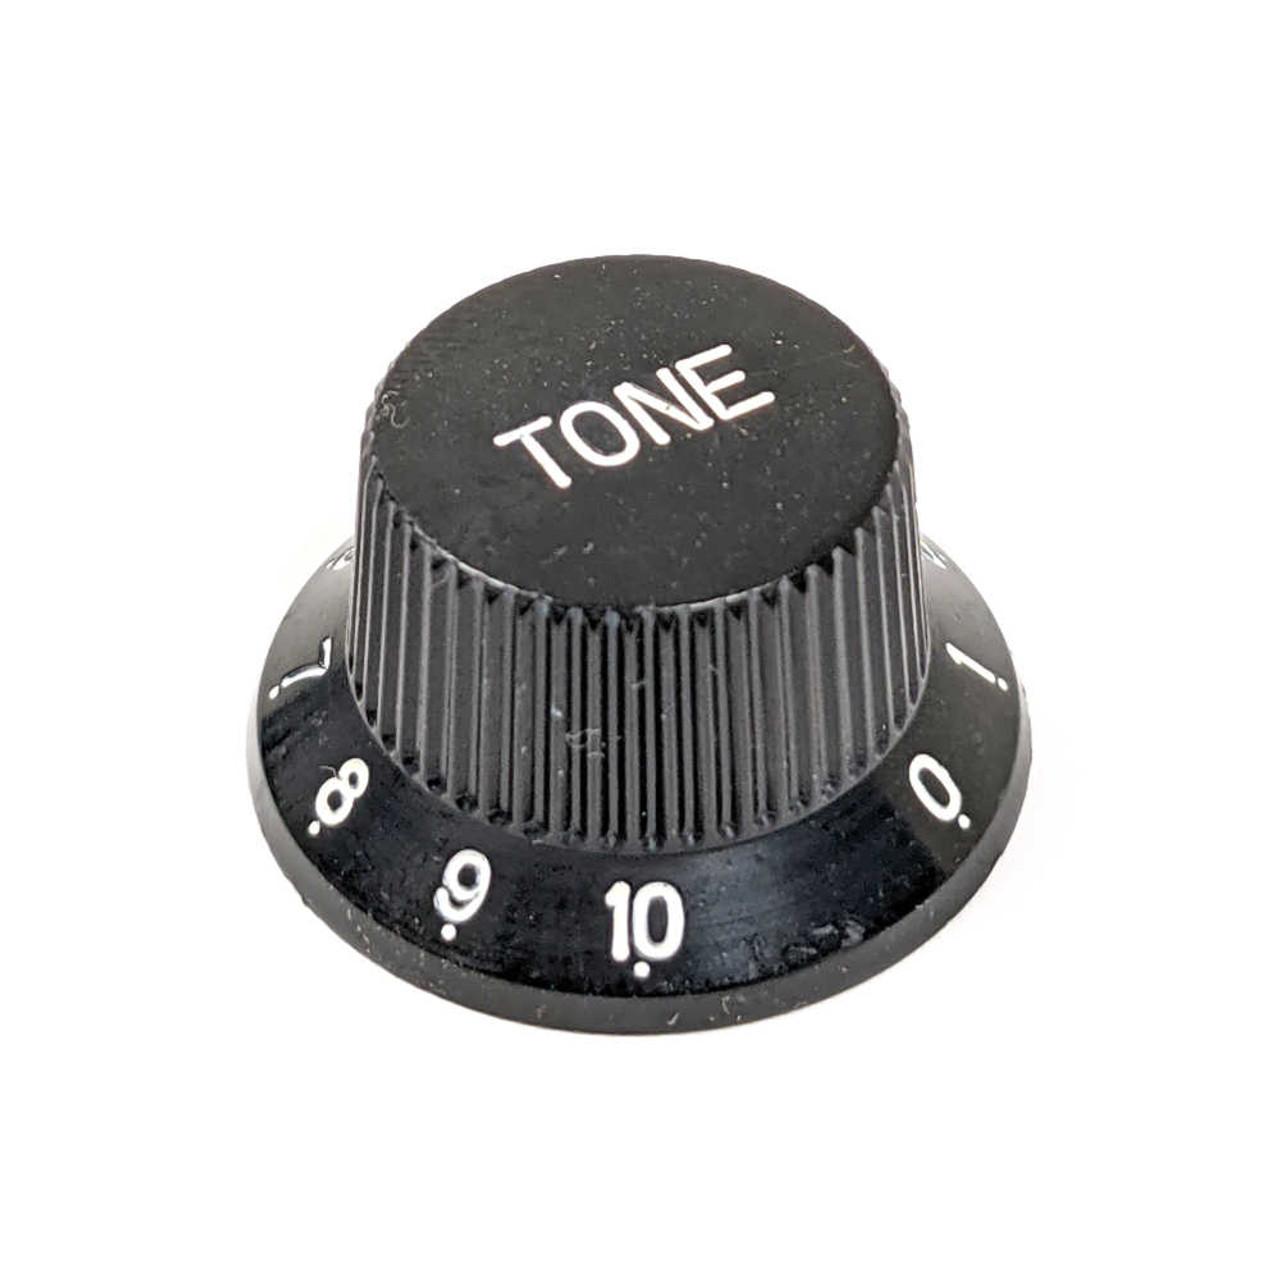 Strat Knob Tone - 18-spline Black (alternate style) CLEARANCE